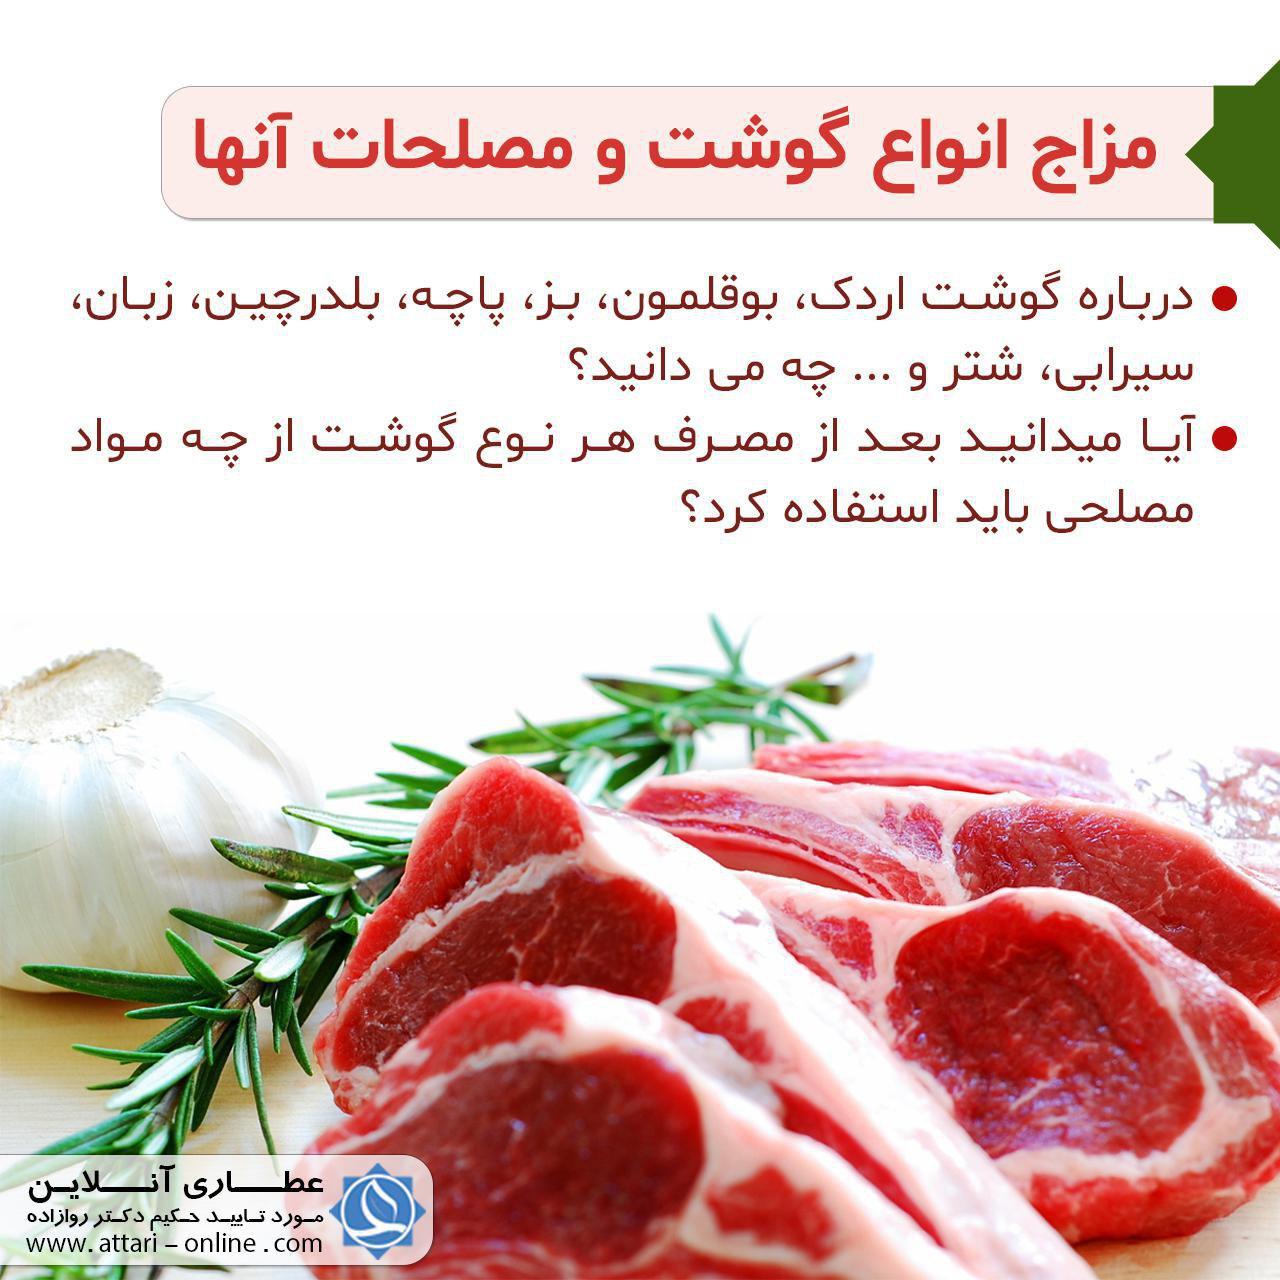 photo 2018 08 04 16 07 59 انواع گوشت، مزاج و مصلحات آنها